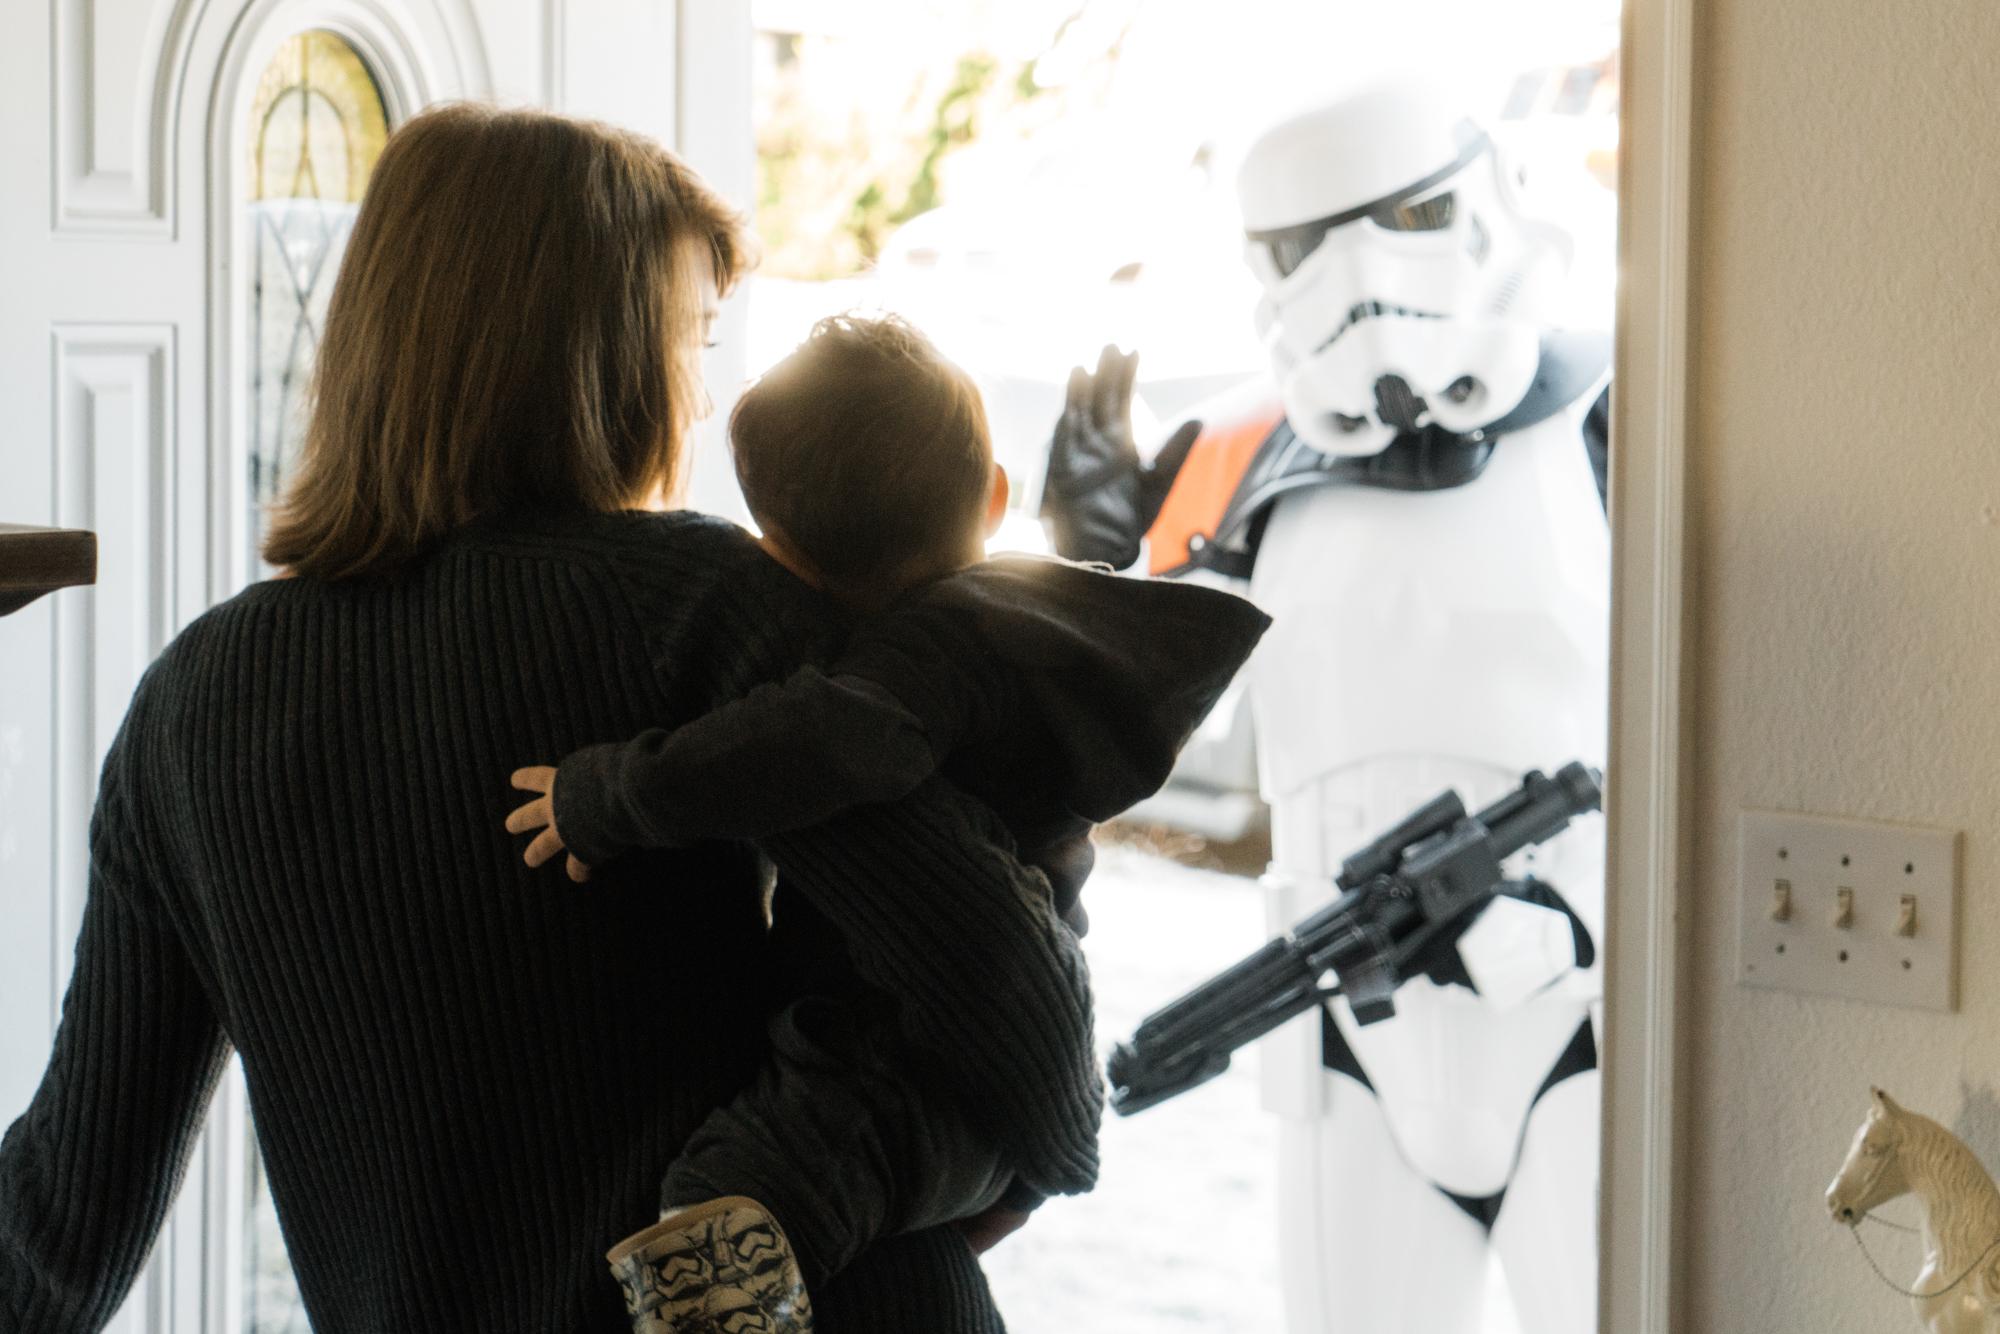 A Star Wars Holiday (Photo Story)-7.jpg